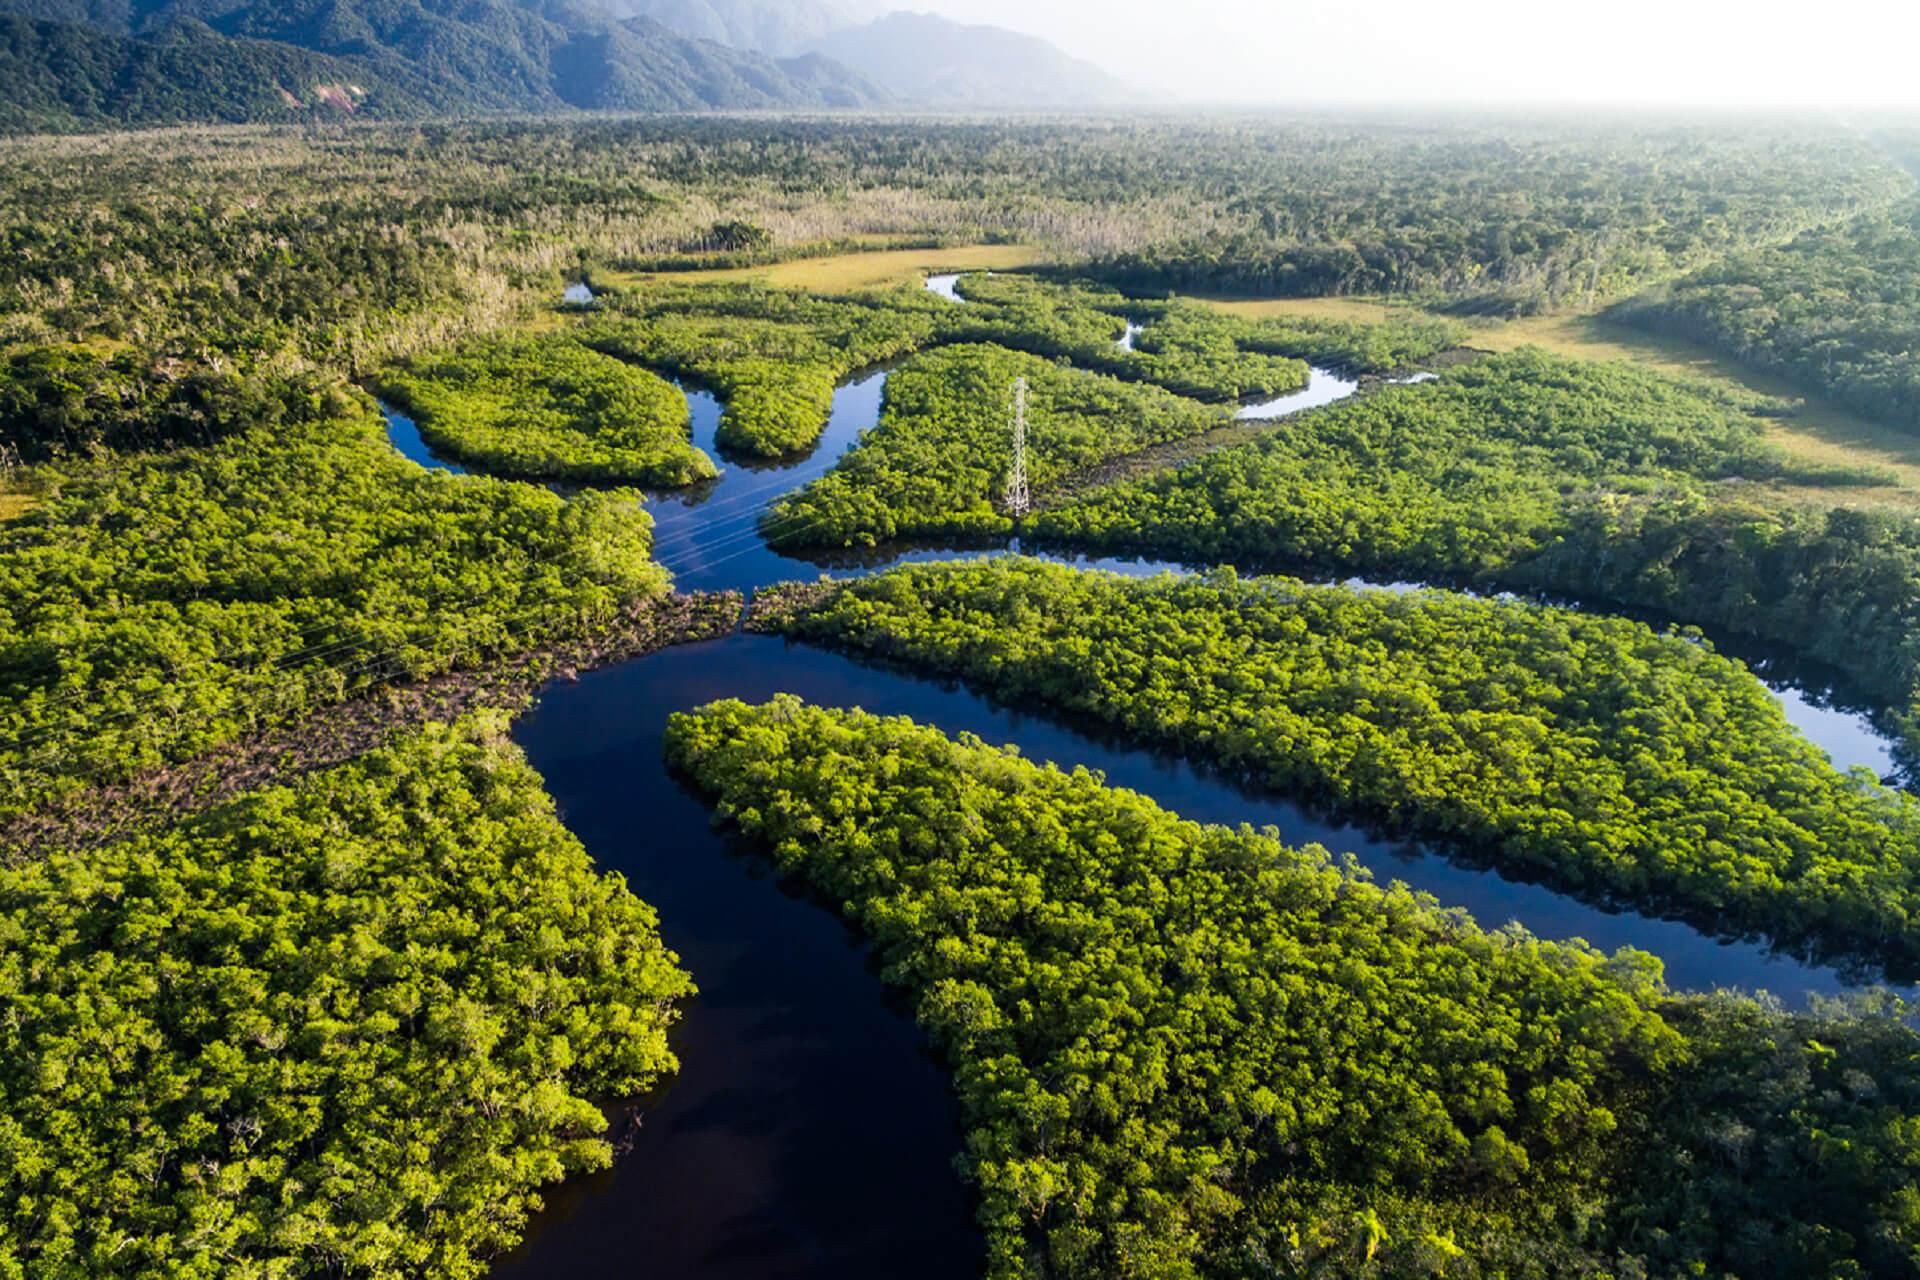 Beaches of the Amazon, Brazil